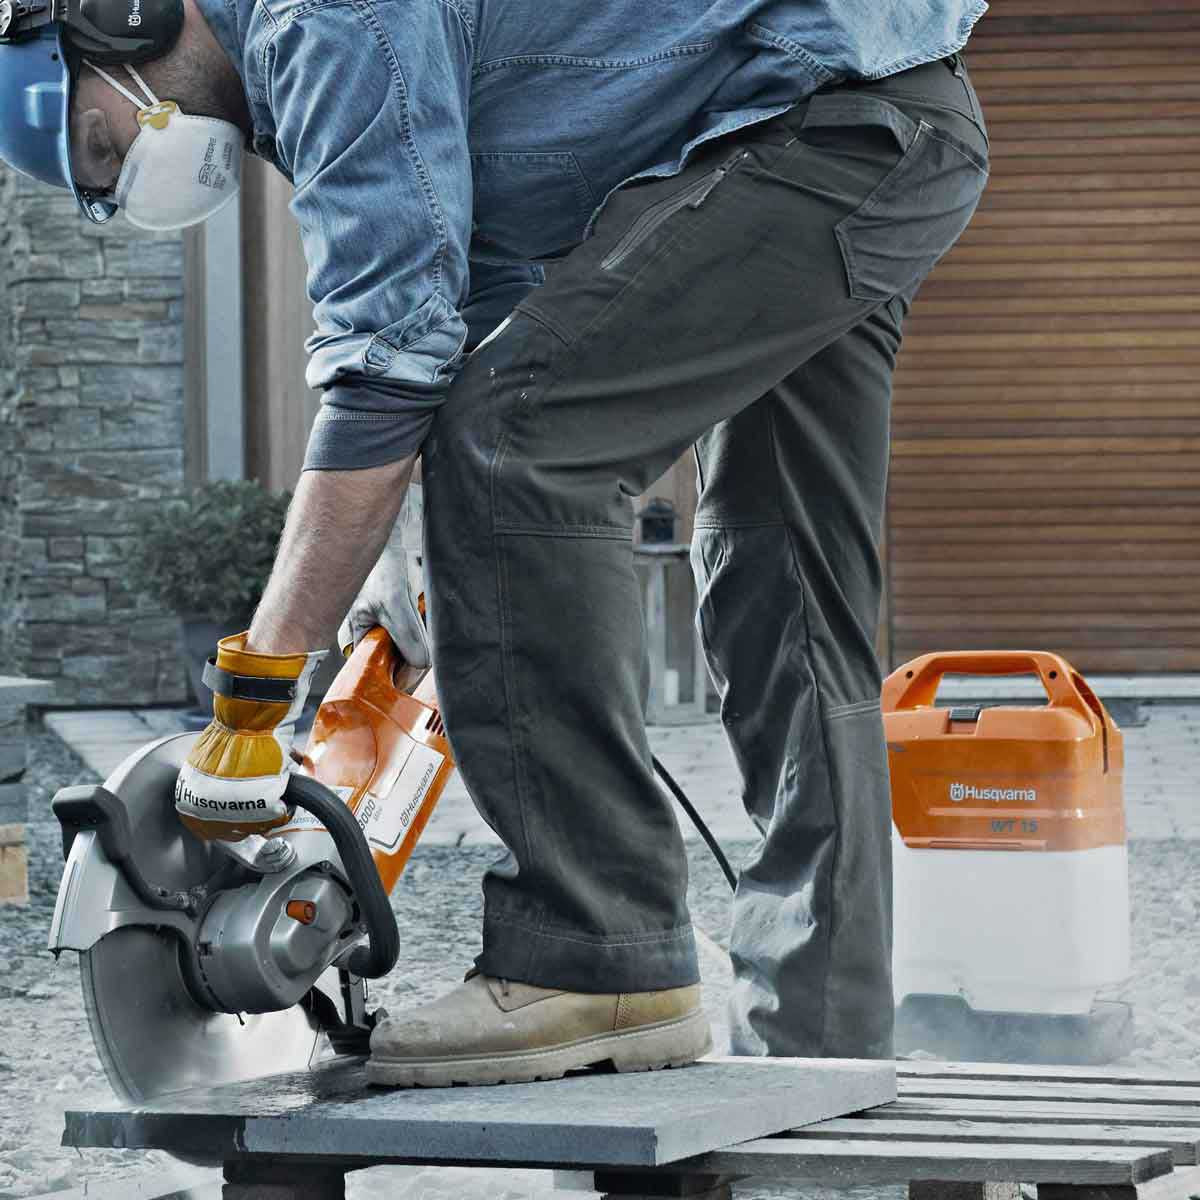 Husqvarna K3000 Wet saw cutting